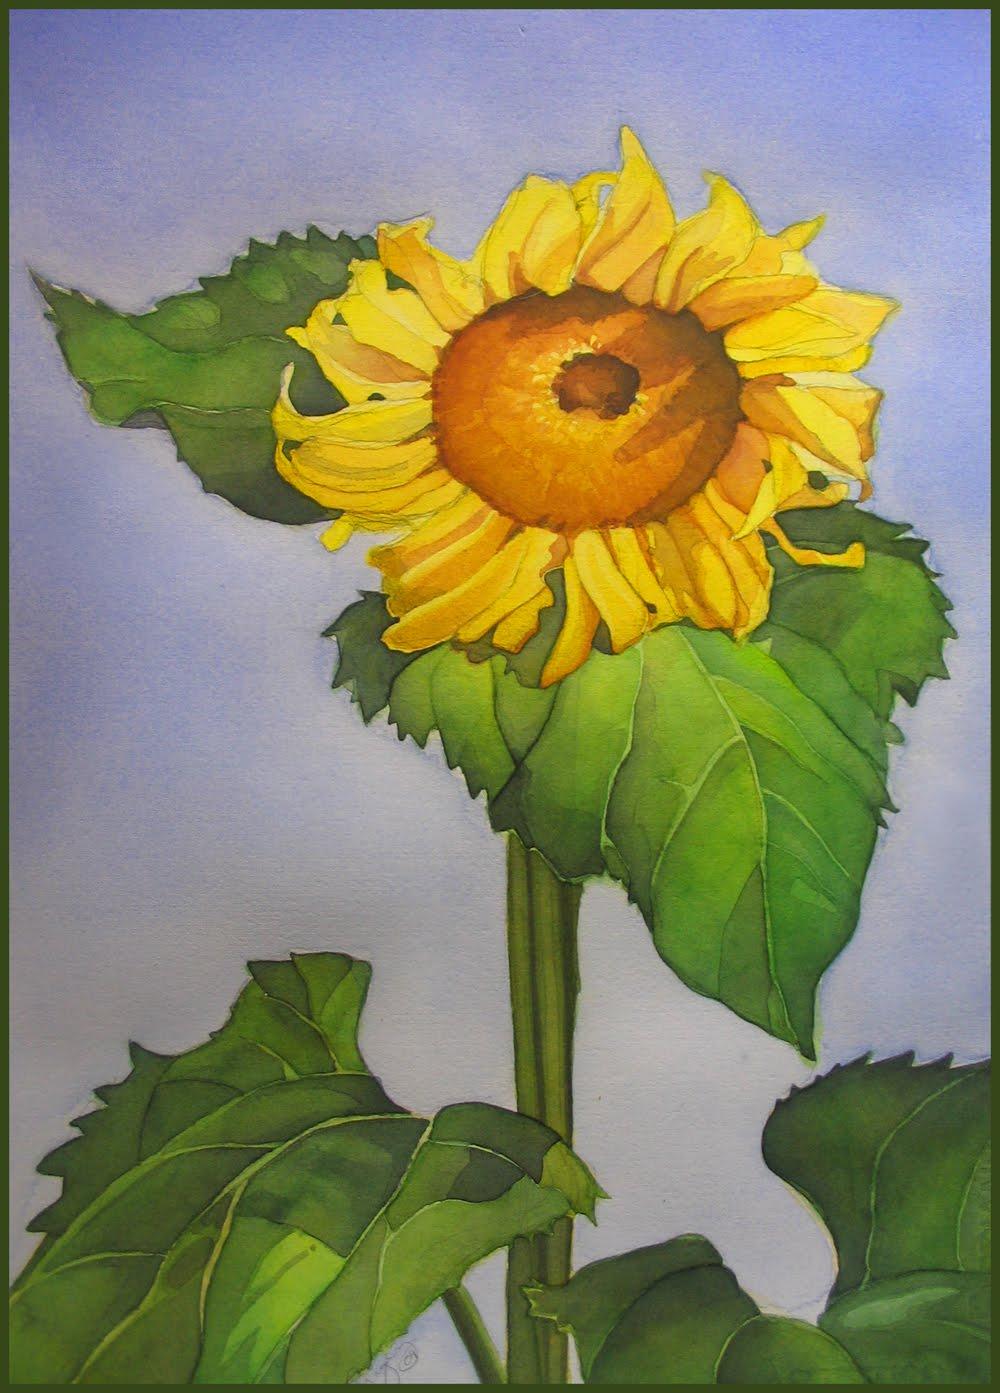 Sunflower copy.jpg